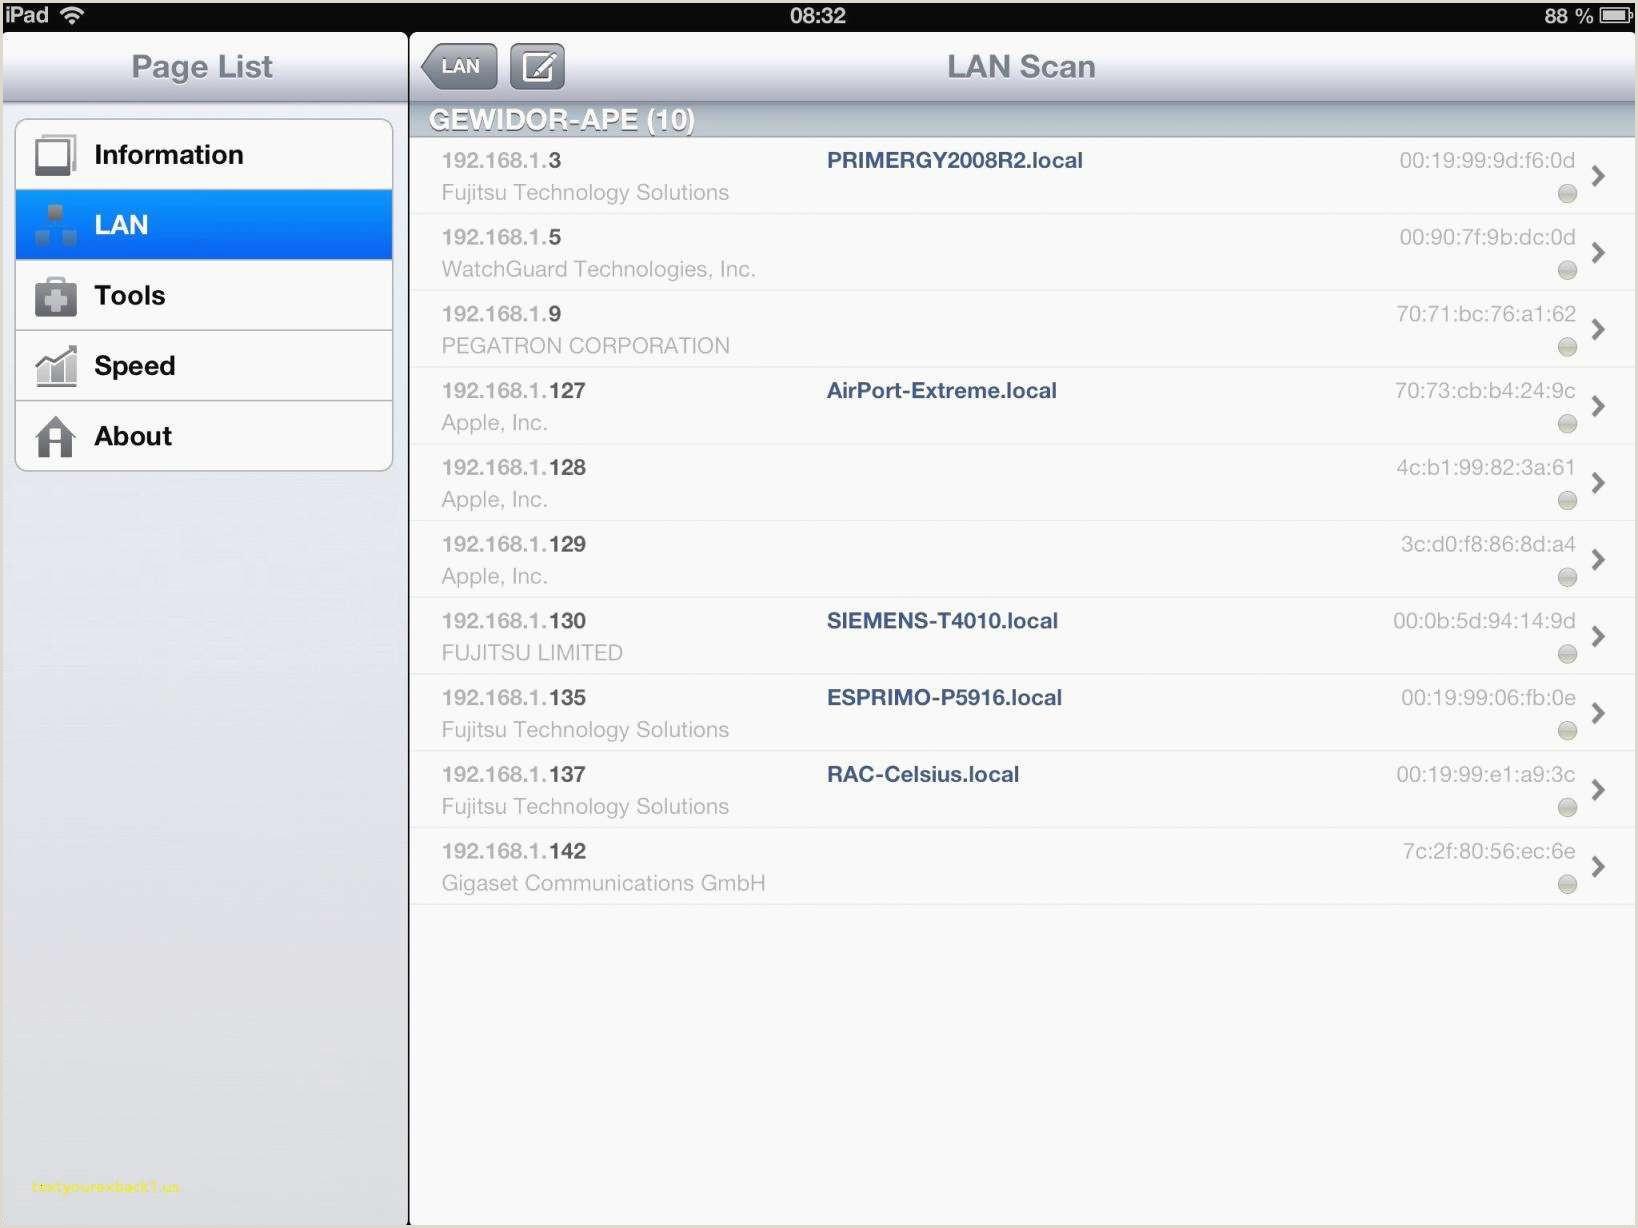 Lebenslauf Muster Nach Din 5008 Bewerbung format 67 Free Lebenslauf Muster Aktuell 2016